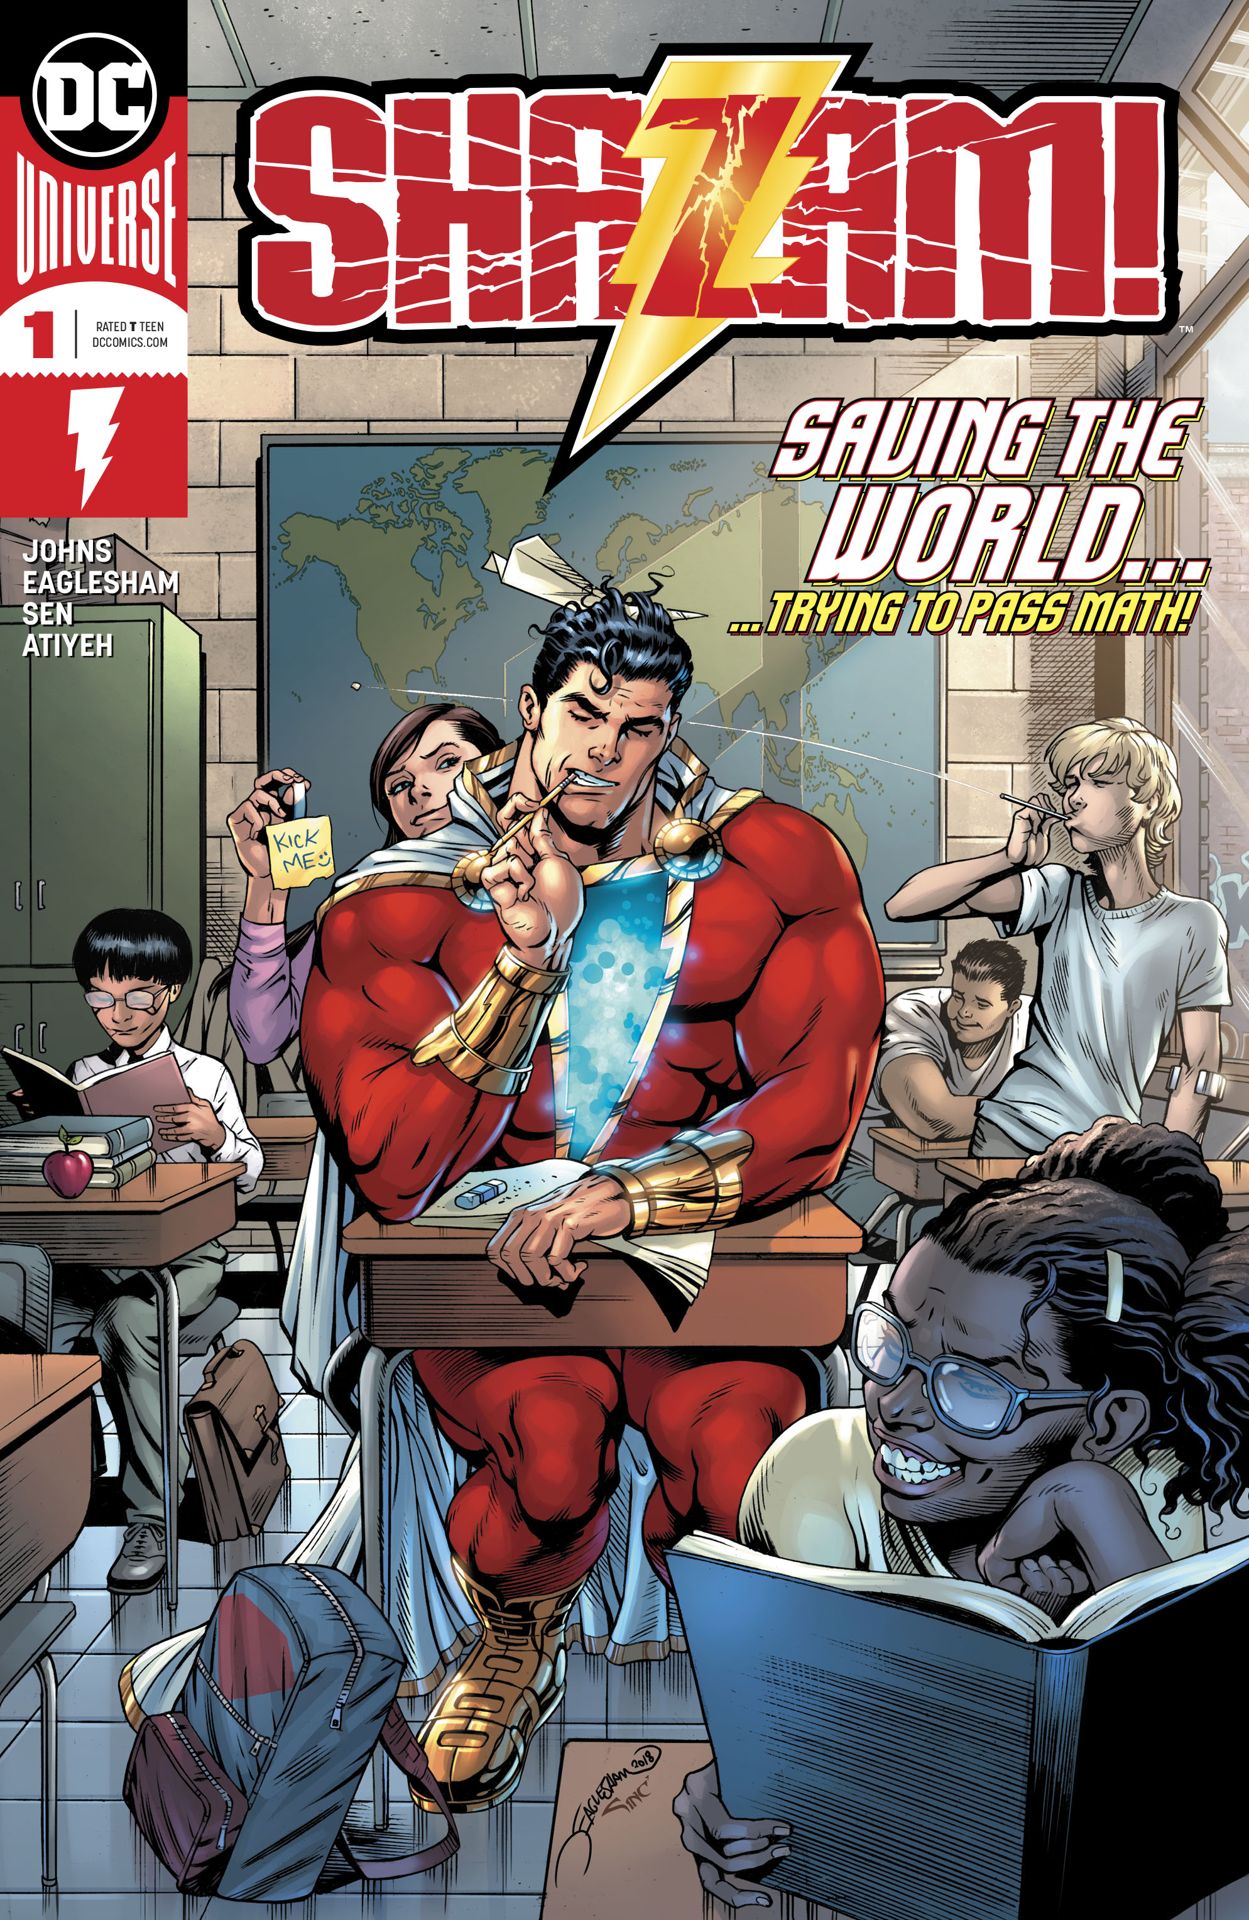 dc comics universe & shazam! #1 spoilers & review: the shazam